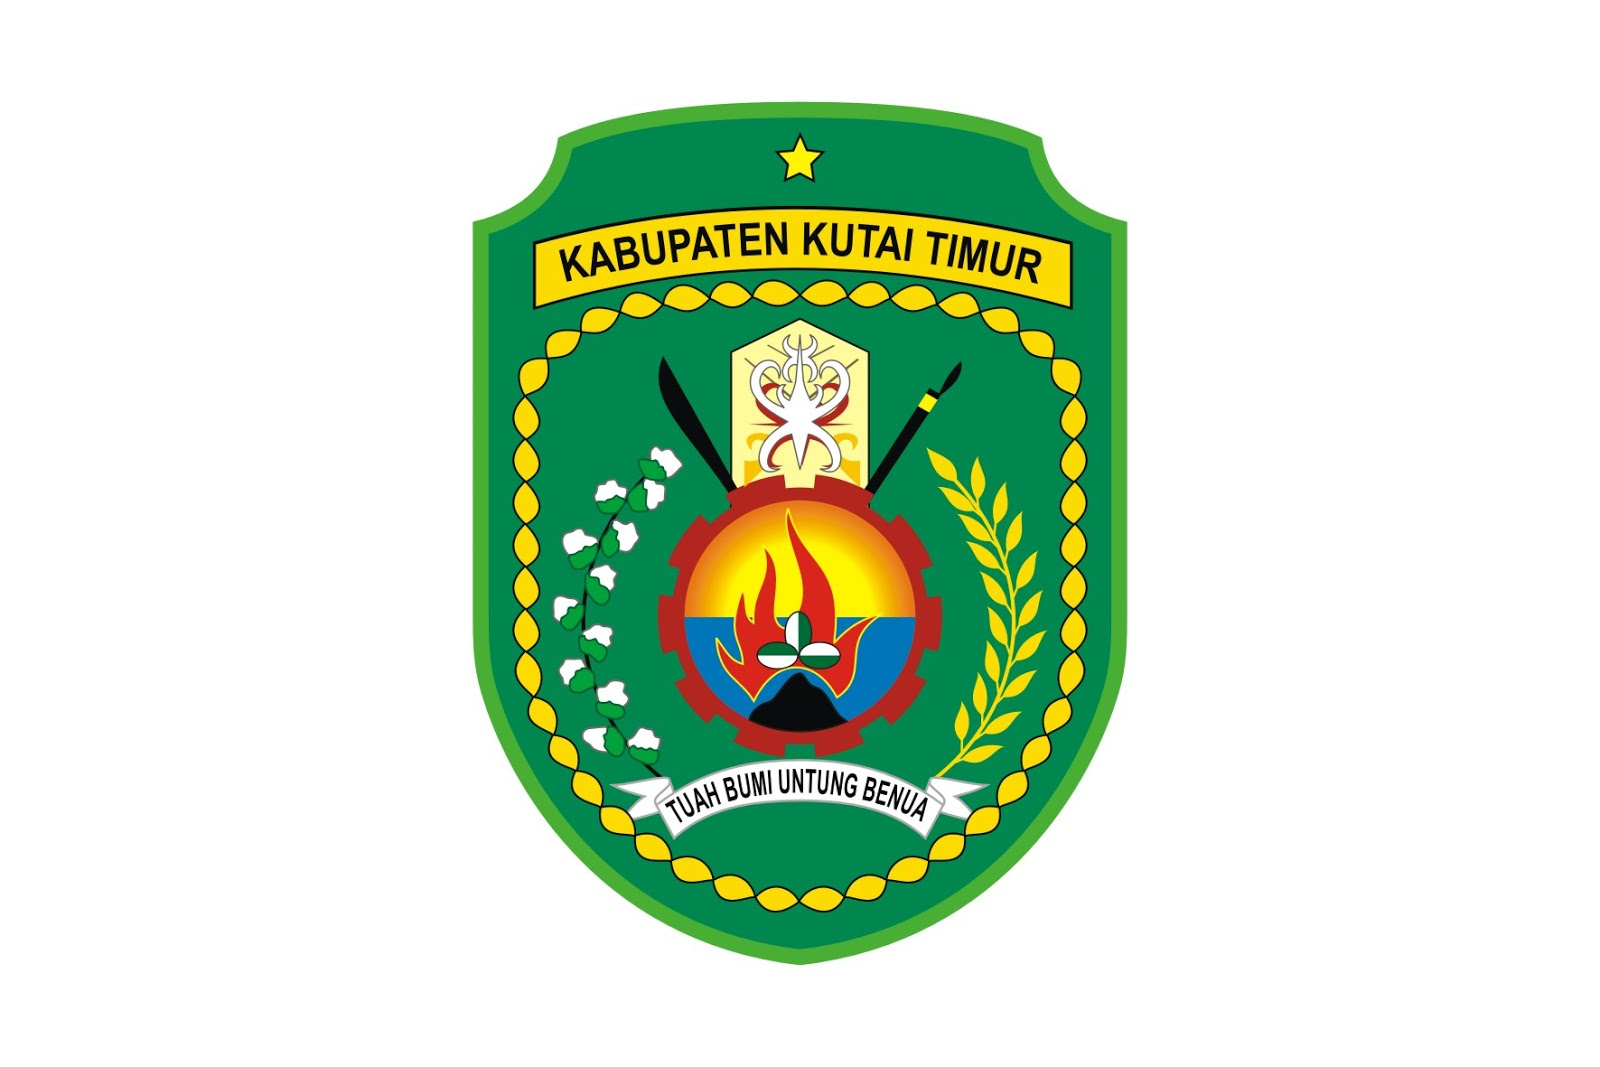 http://1.bp.blogspot.com/-w7fcjHl0Jyw/UO_8FIxifxI/AAAAAAAAE2Q/2gHzGqFLxQ8/s1600/Logo+Kabupaten+Kutai+Timur.jpg